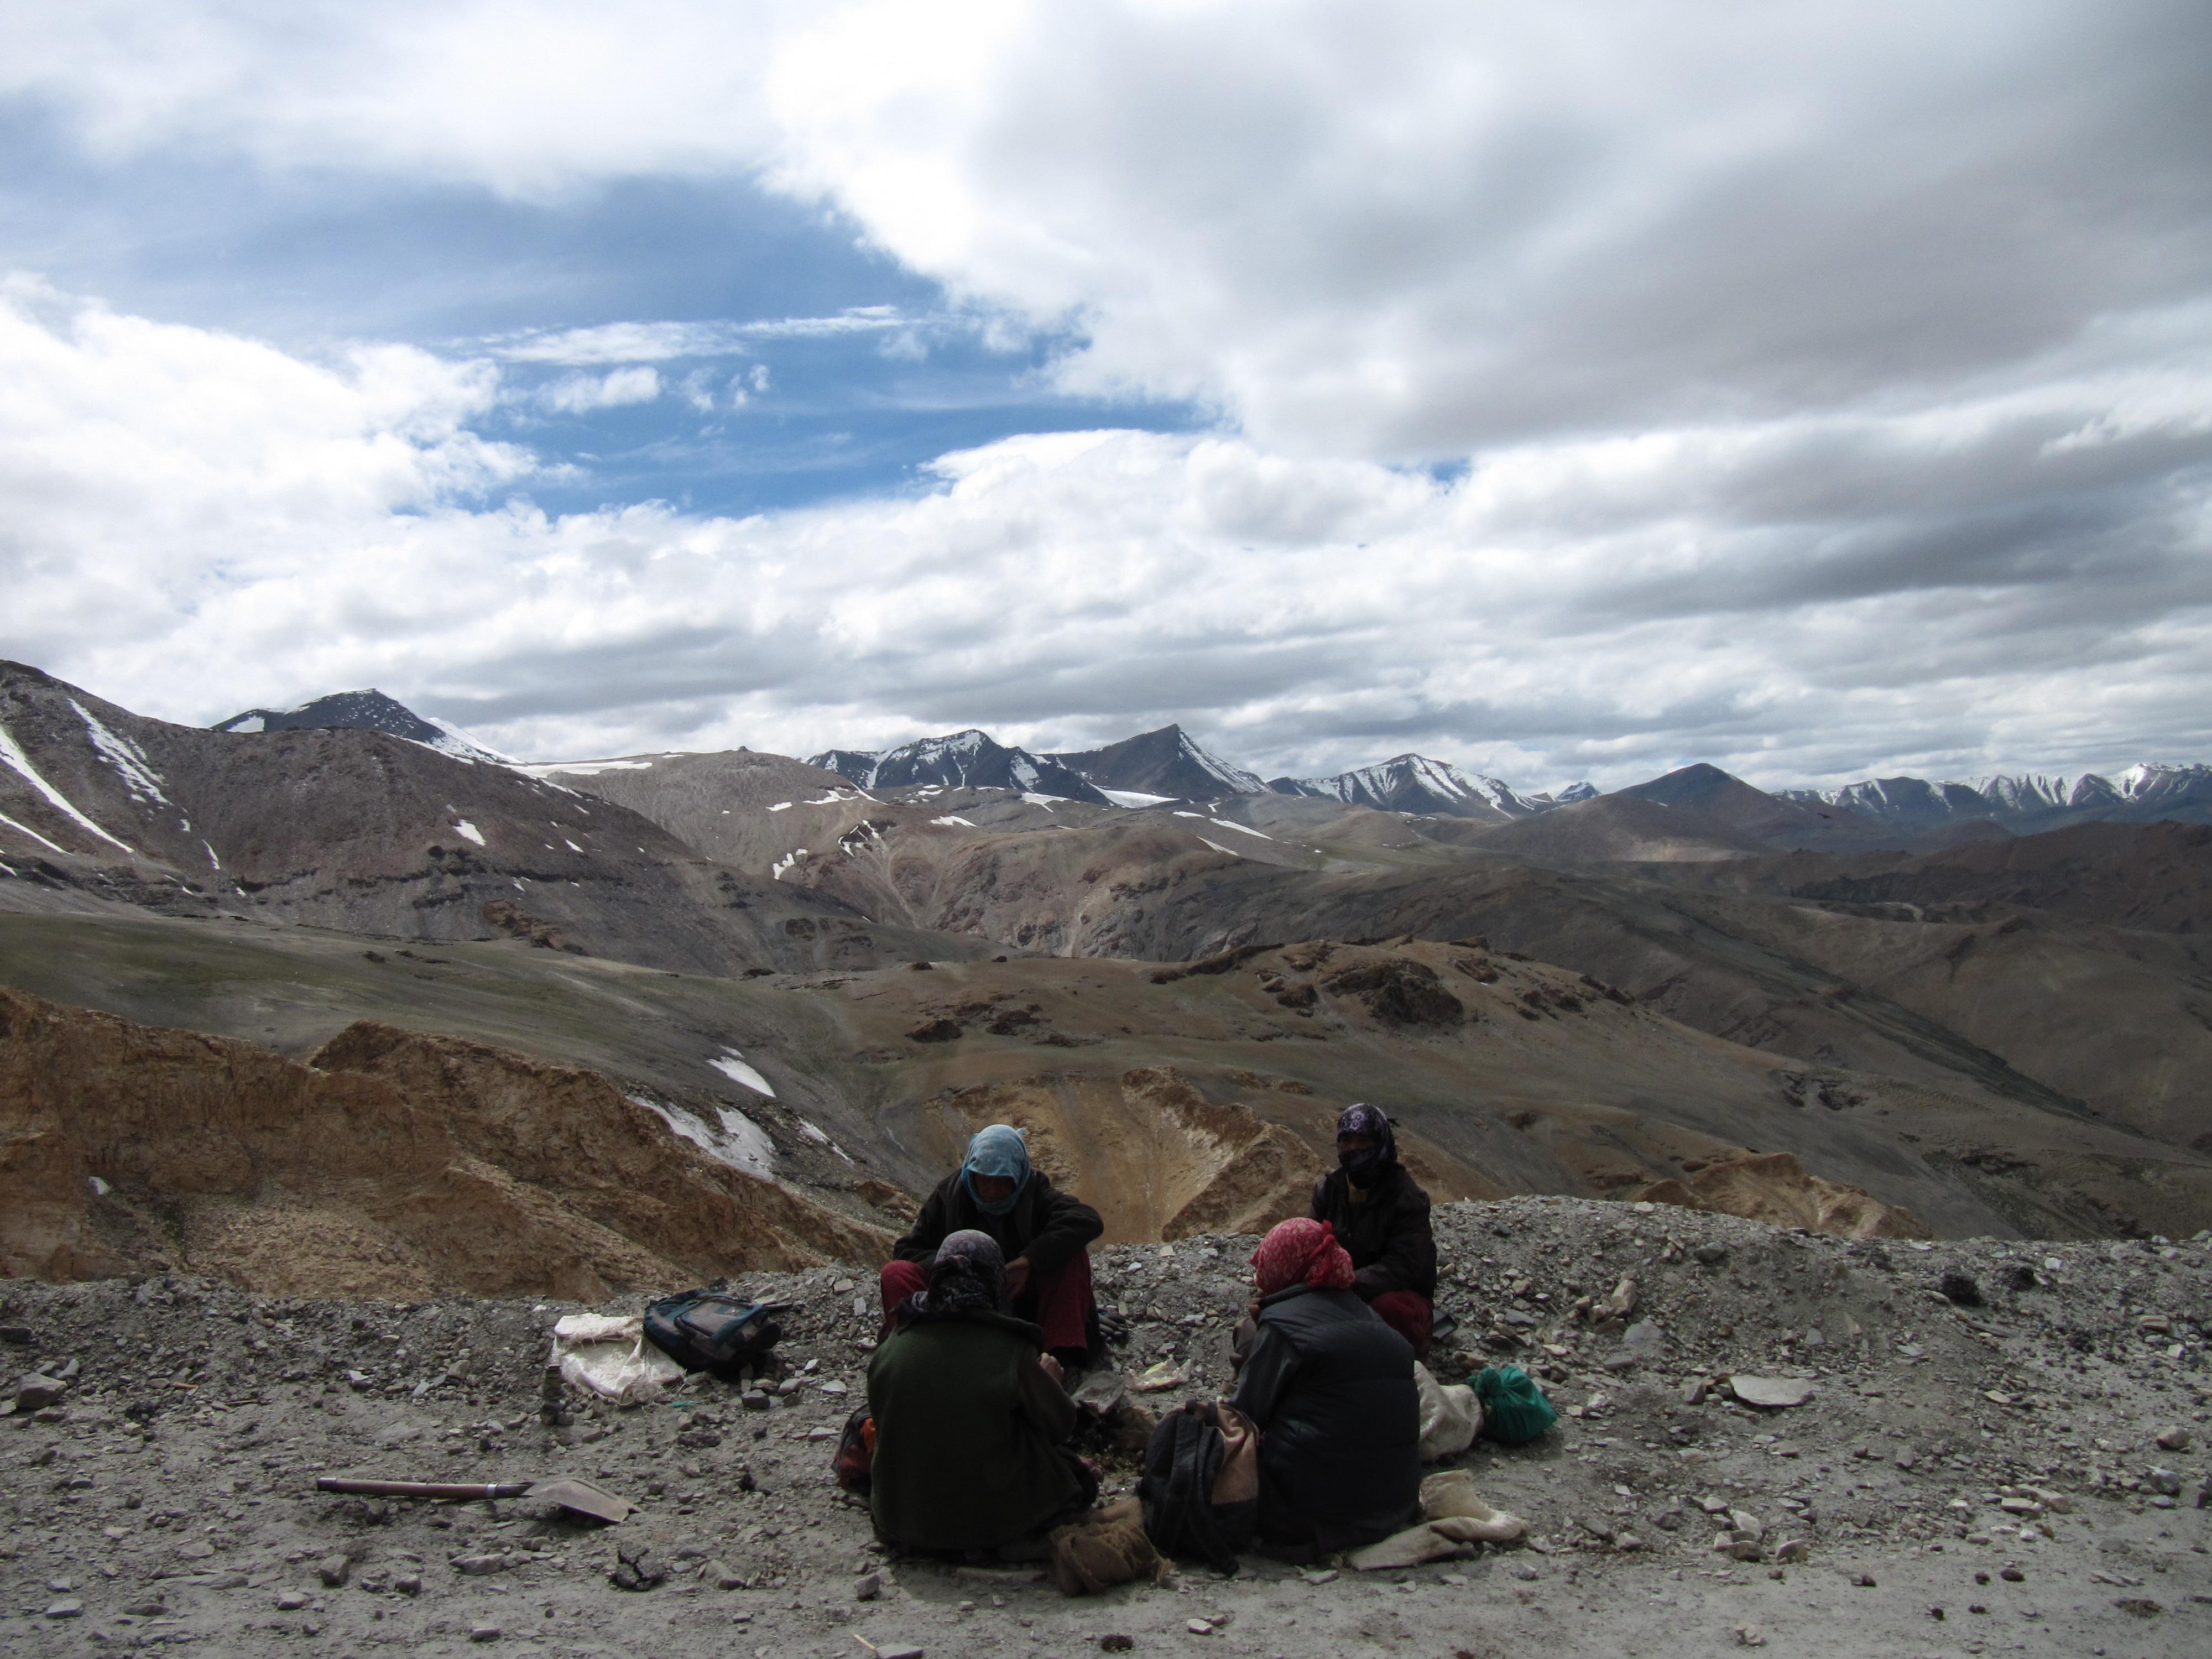 Dura via, sed via, à l'approche de Leh, Inde, 4 juillet 2013